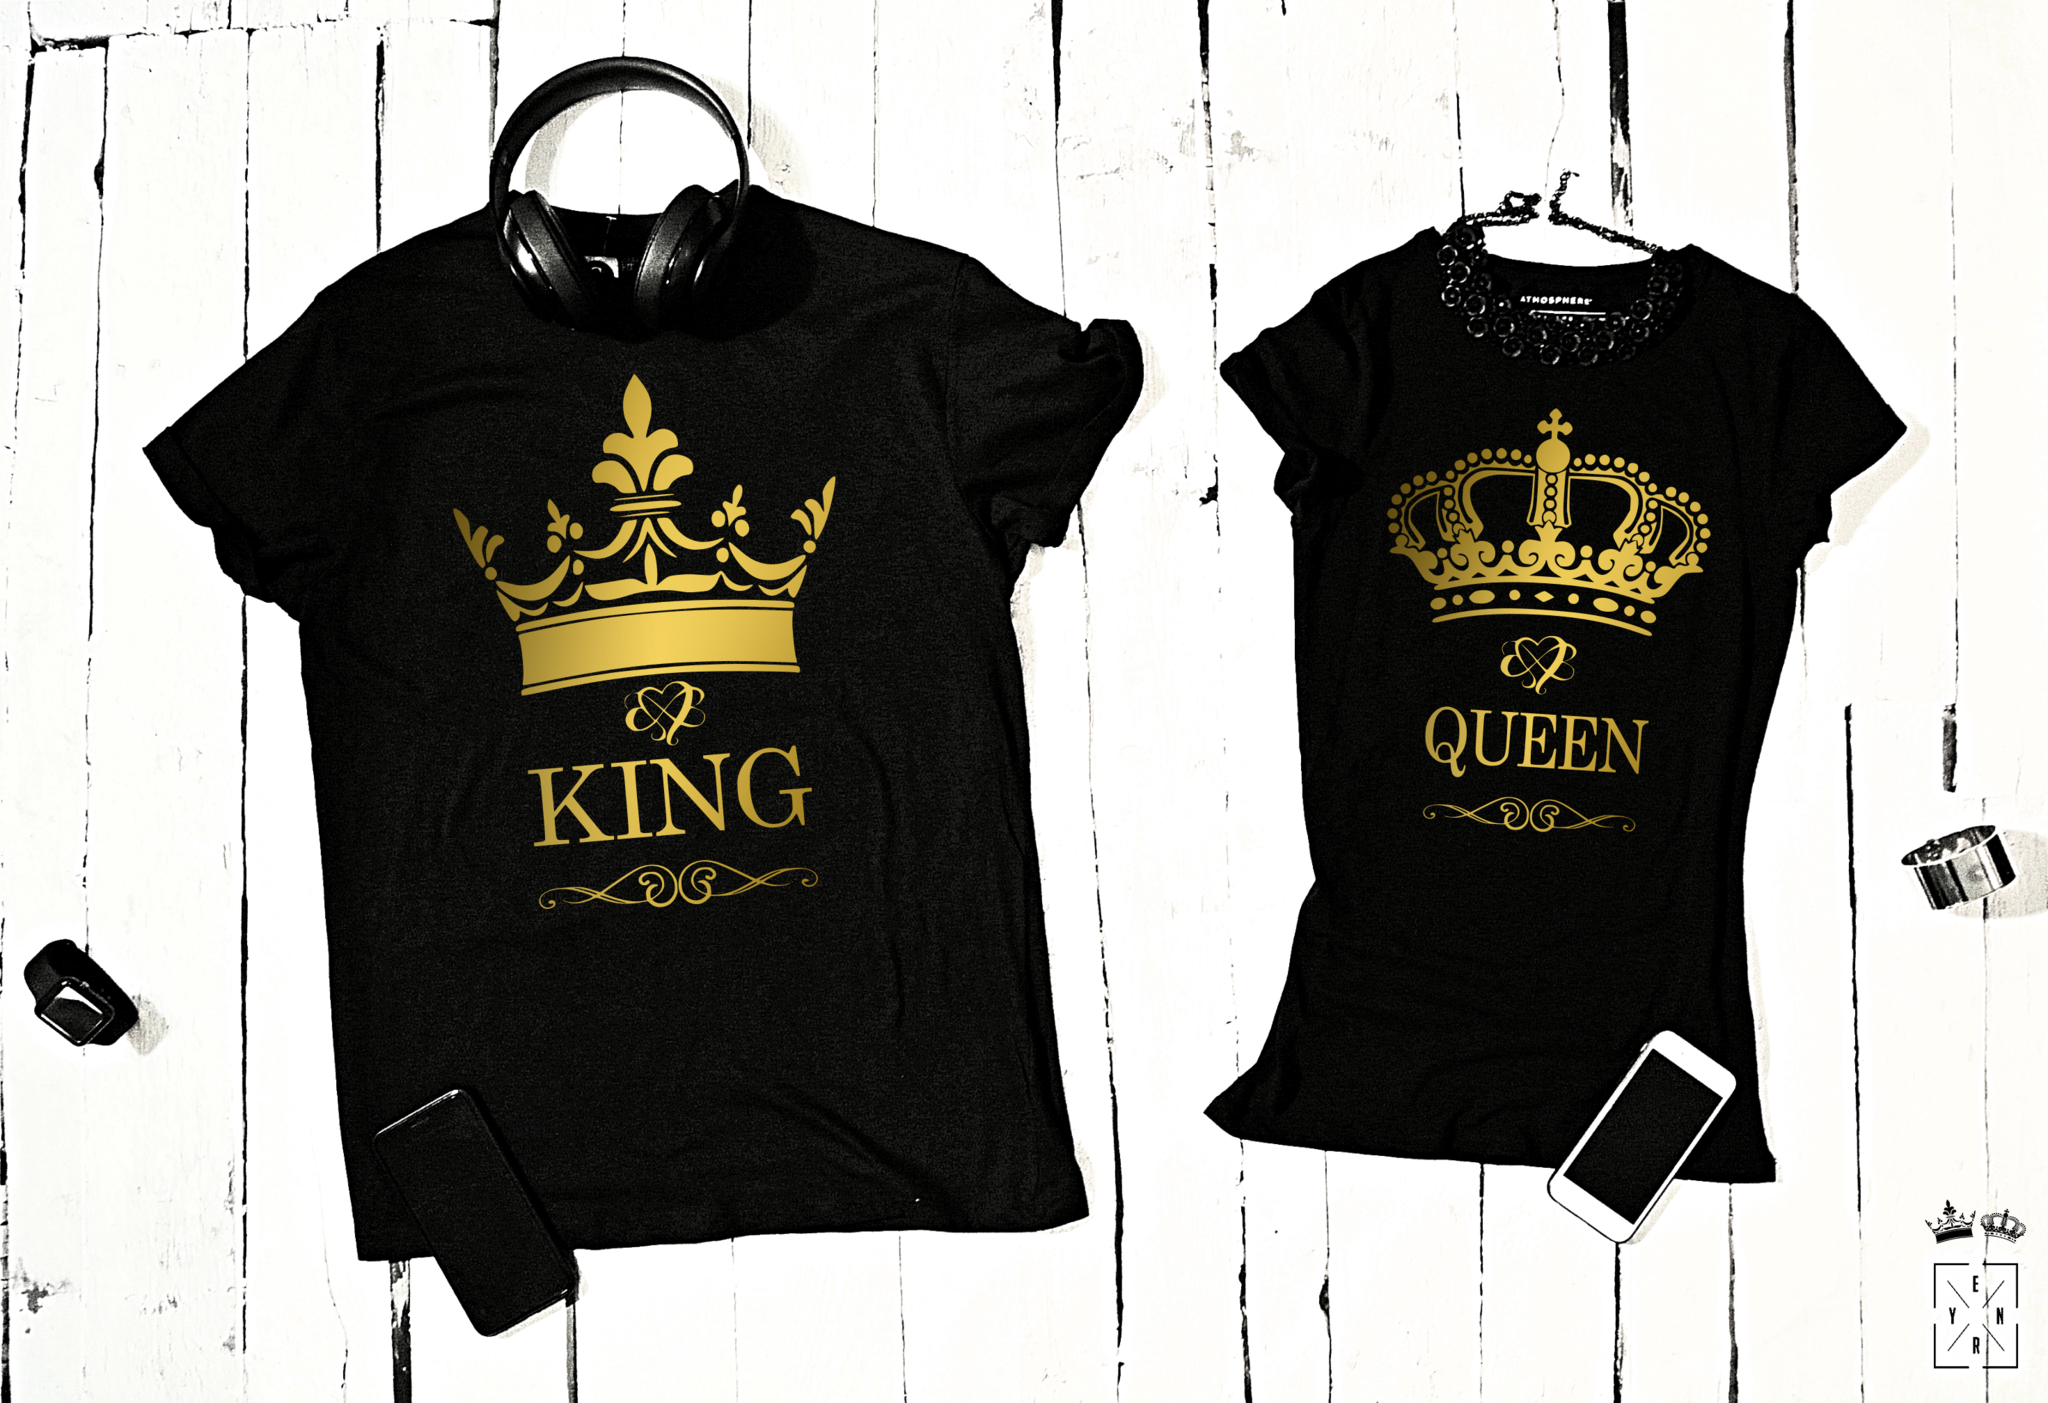 8a5d8cf187 EnryPrint.com | DIY | Shirts, Couple tshirts, Couple tee shirts